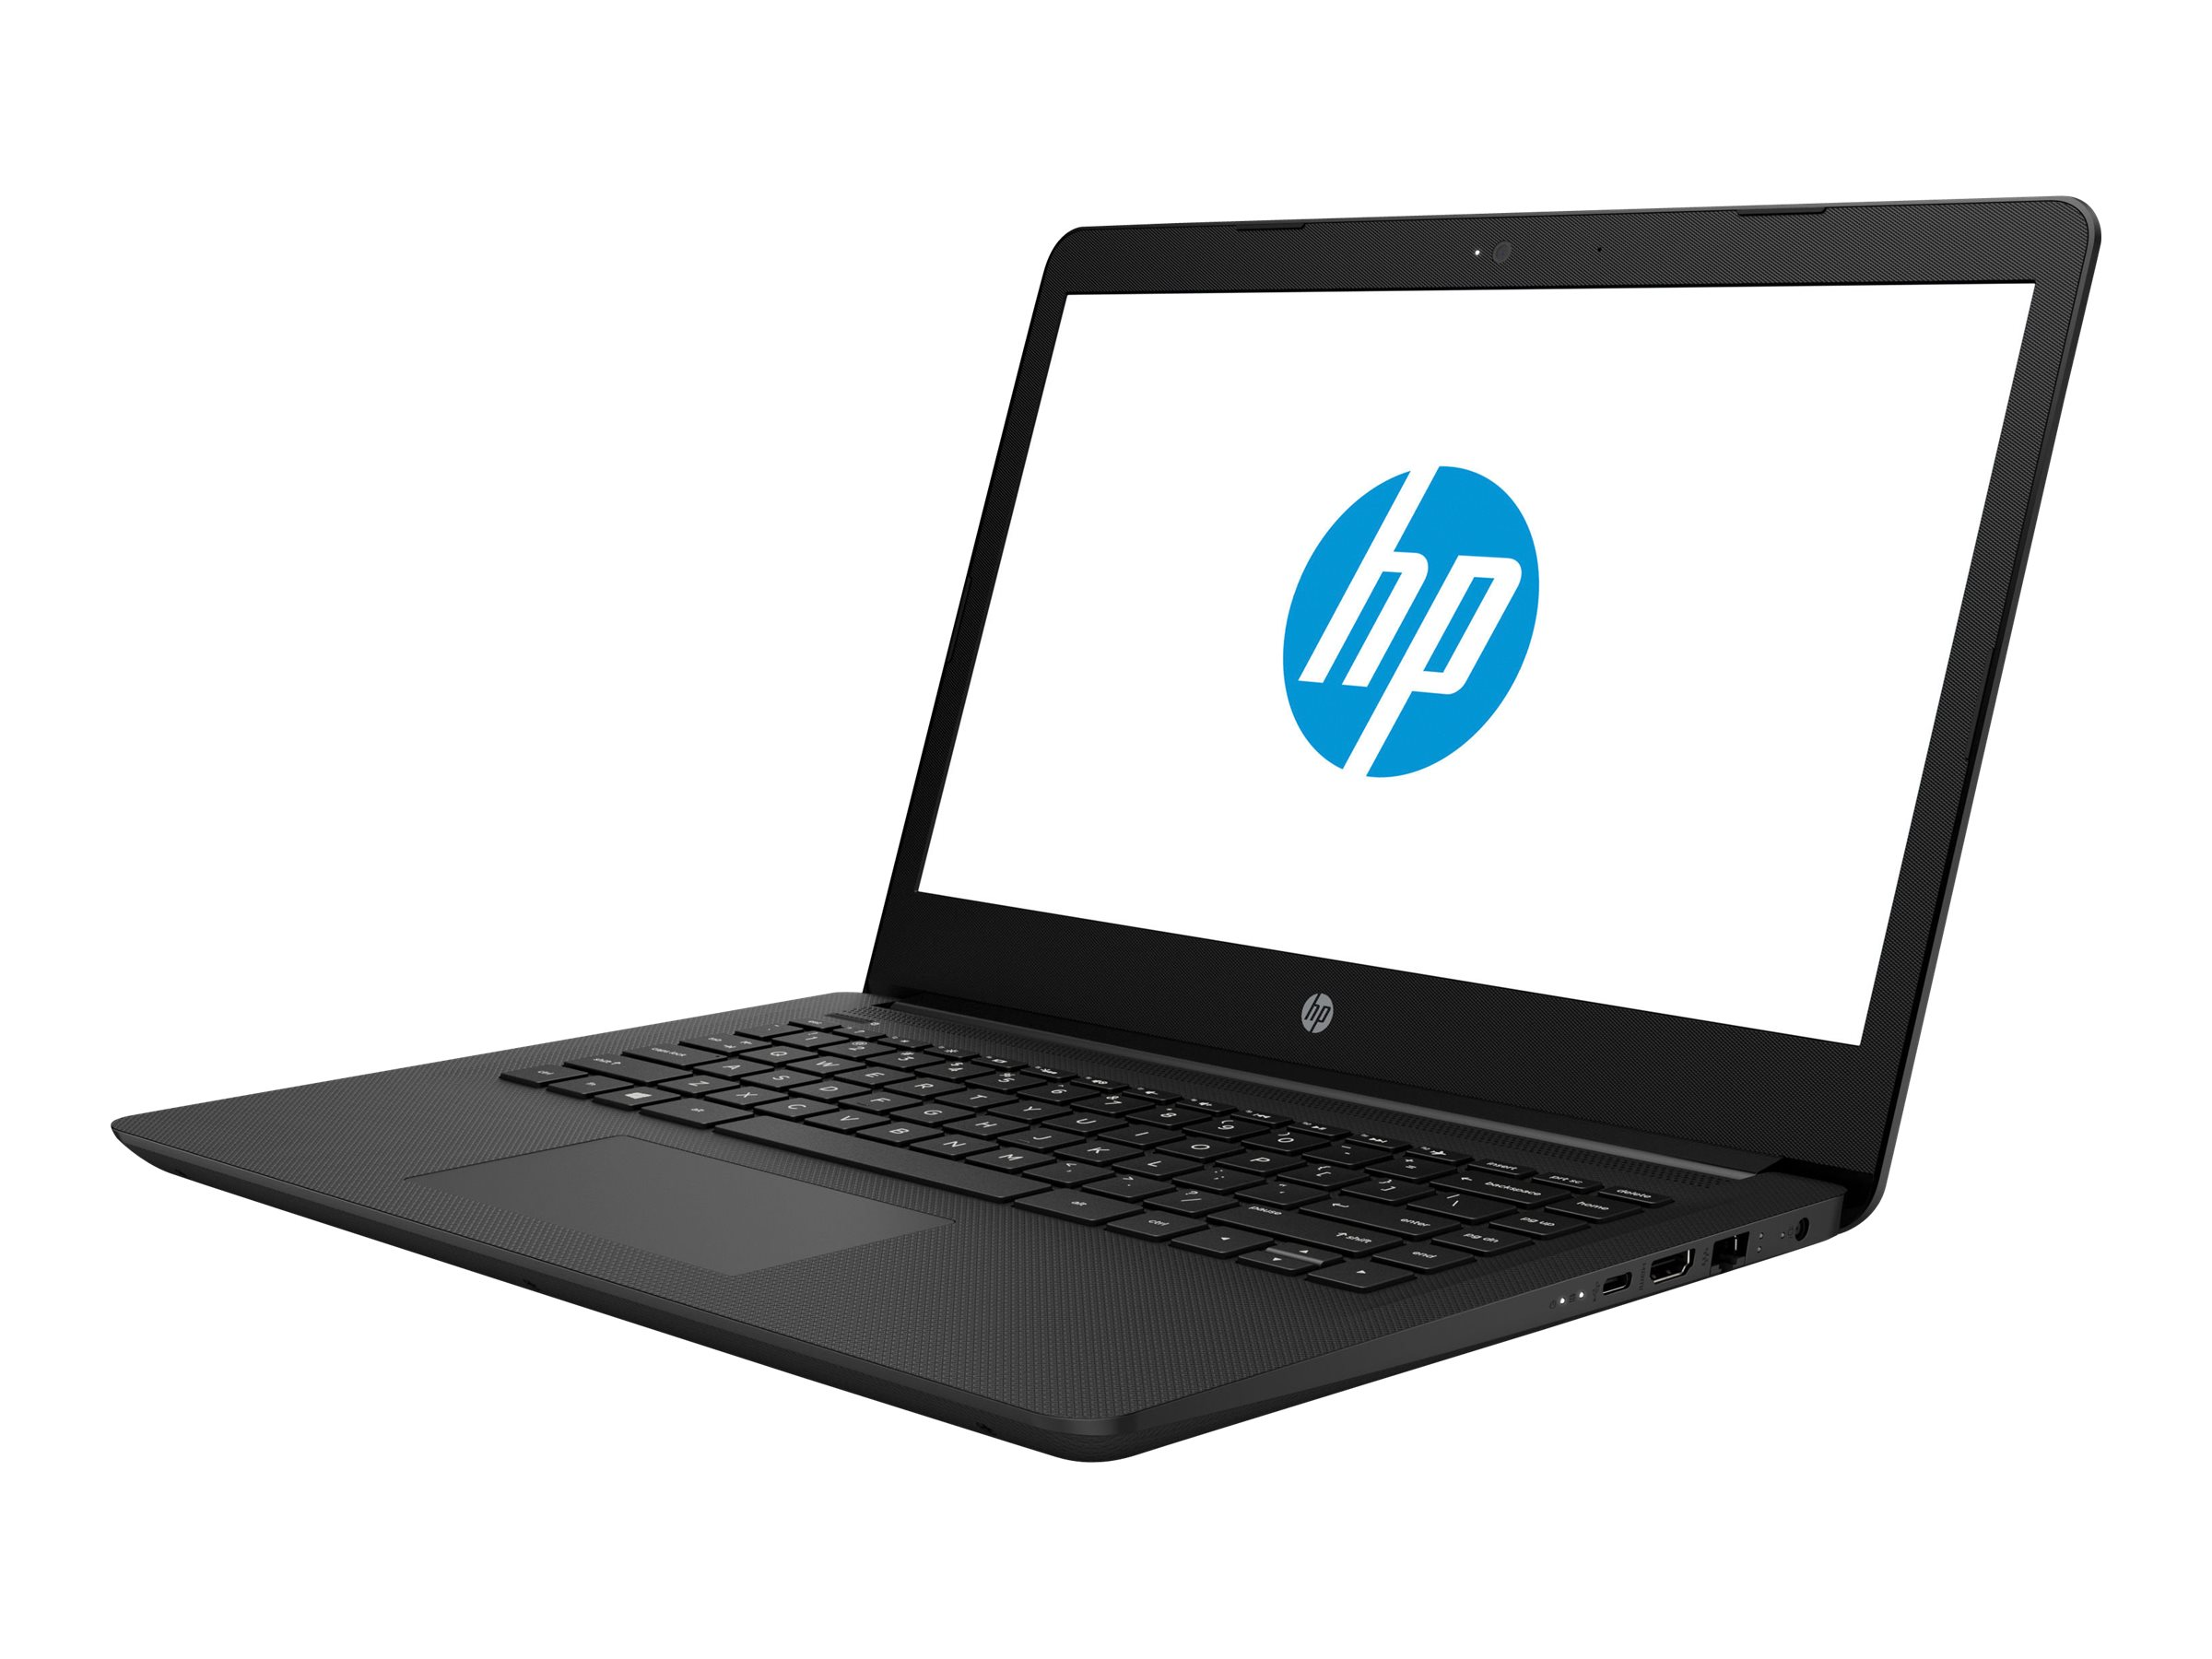 "HP 14 bp001ng 14"" HD Pentium N3710 Quad Core 4GB RAM 500GB HDD Win 10 1UQ81EA"